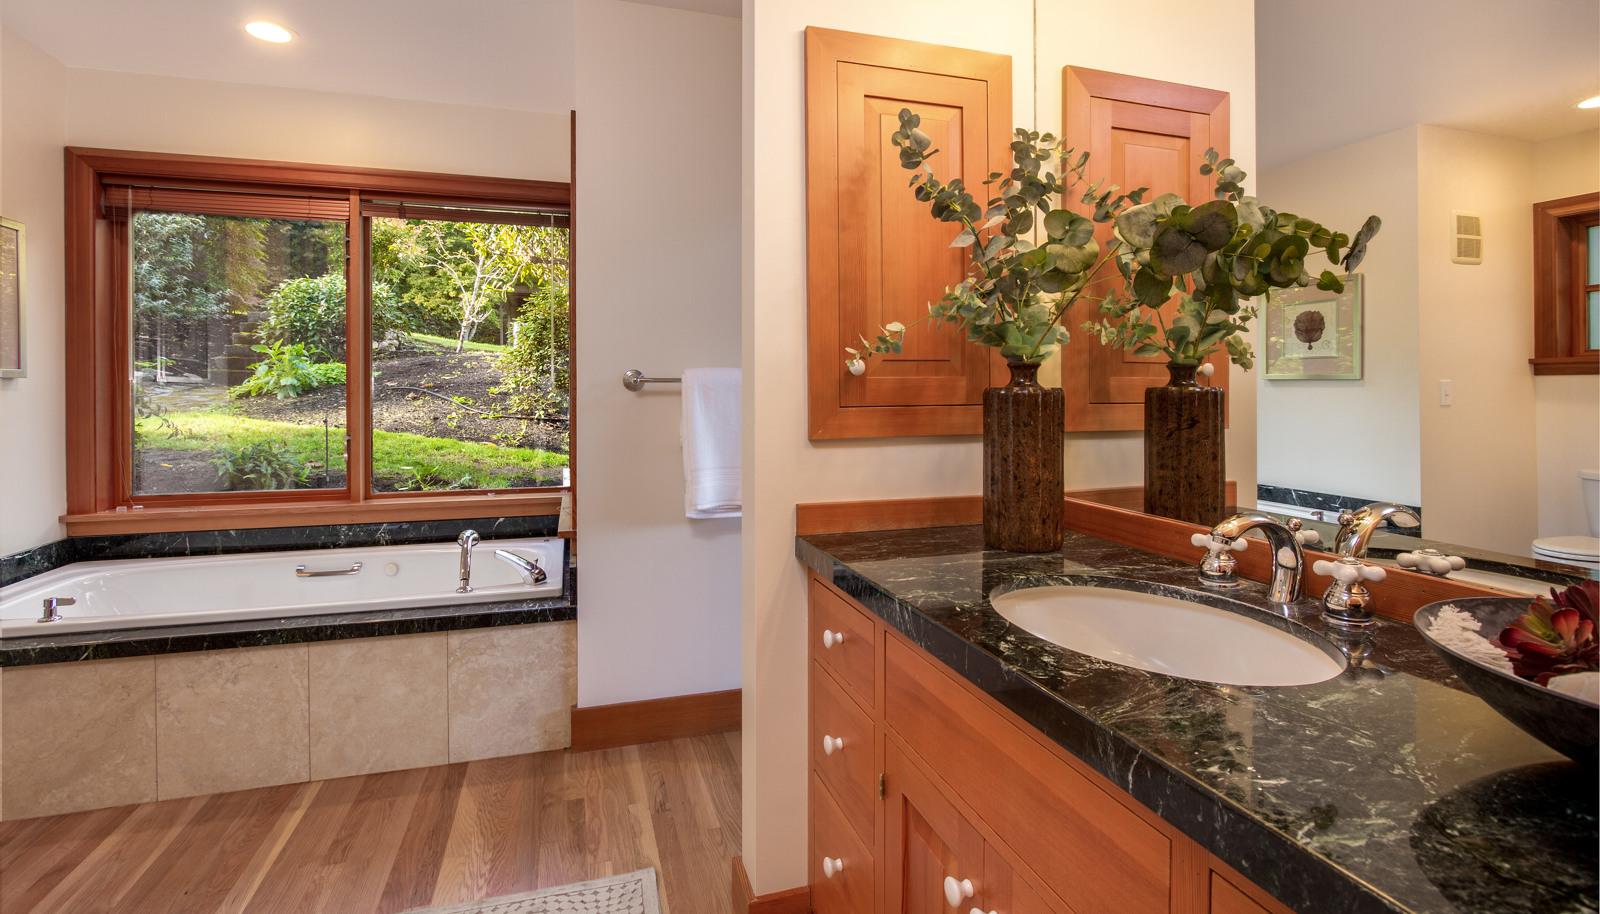 Master bath with jetted soaking tub, hardwood floors, marble vanity.